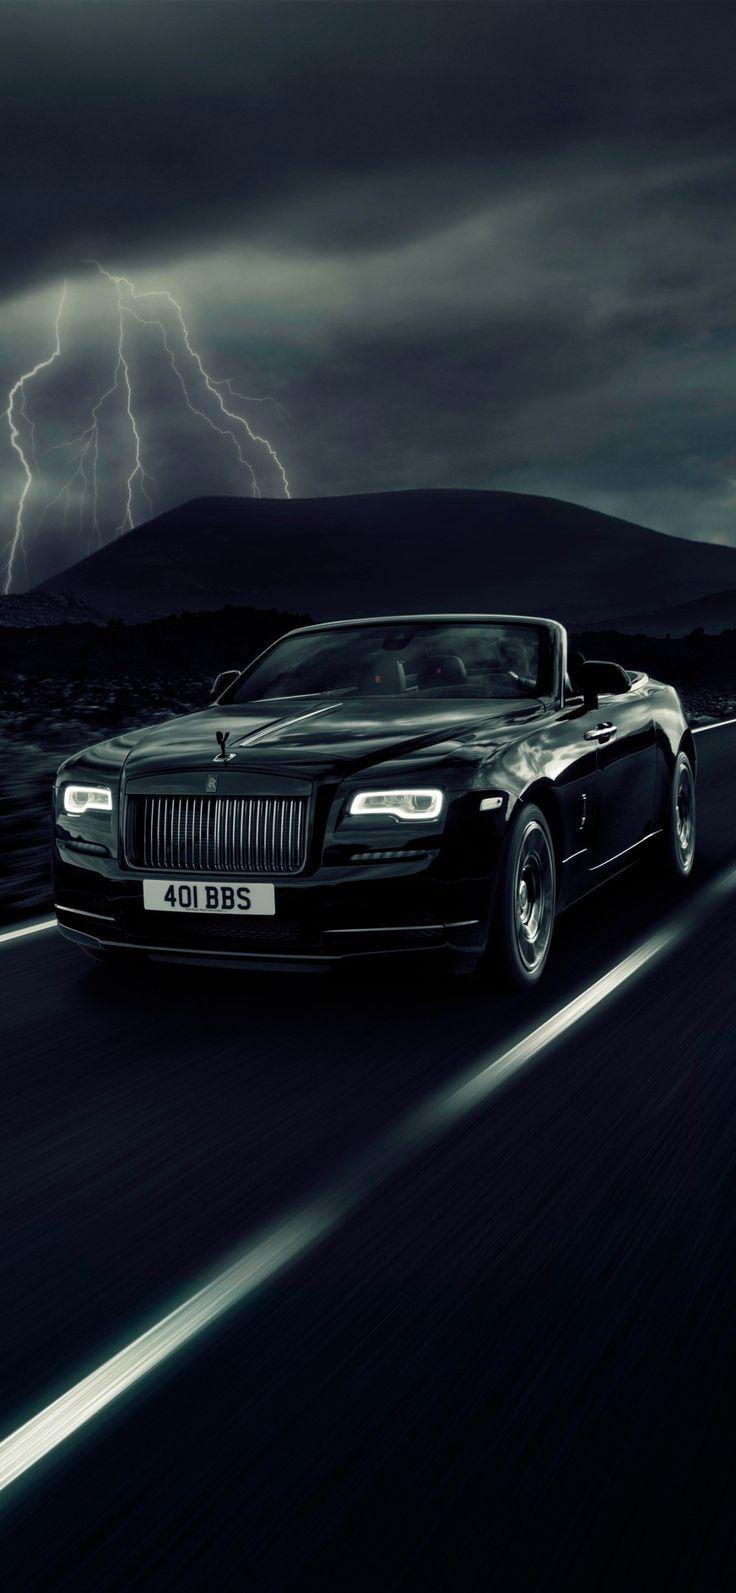 Rolls Royce Wallpaper Iphone Luxury Cars Rolls Royce Dawn Luxury Cars Rolls Royce Rolls Royce